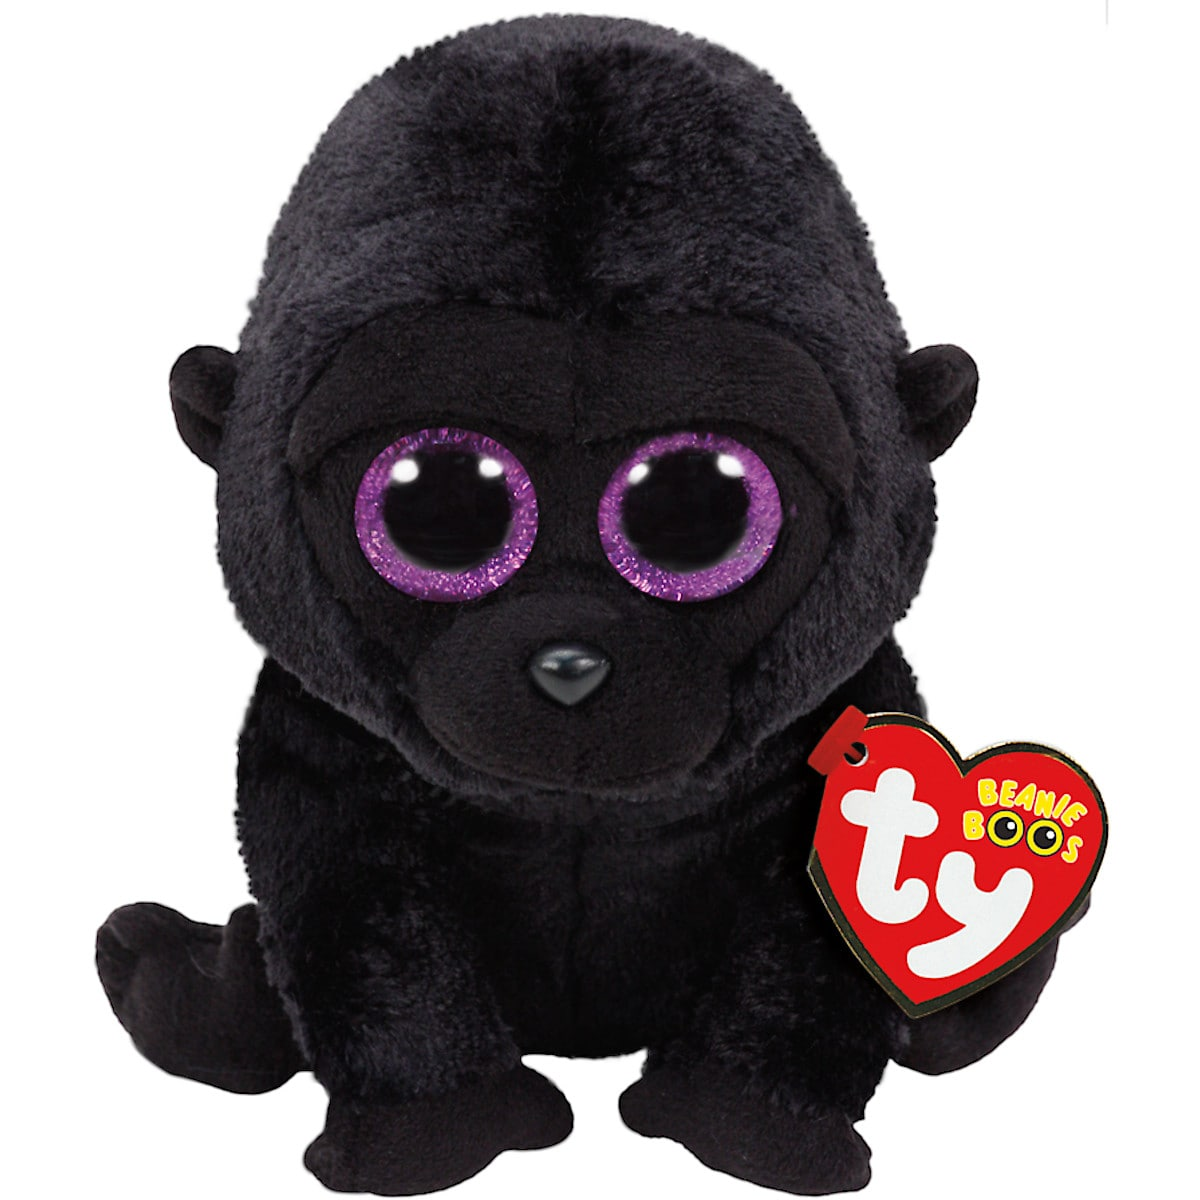 Pehmolelu gorilla George, Ty Beanie Boos